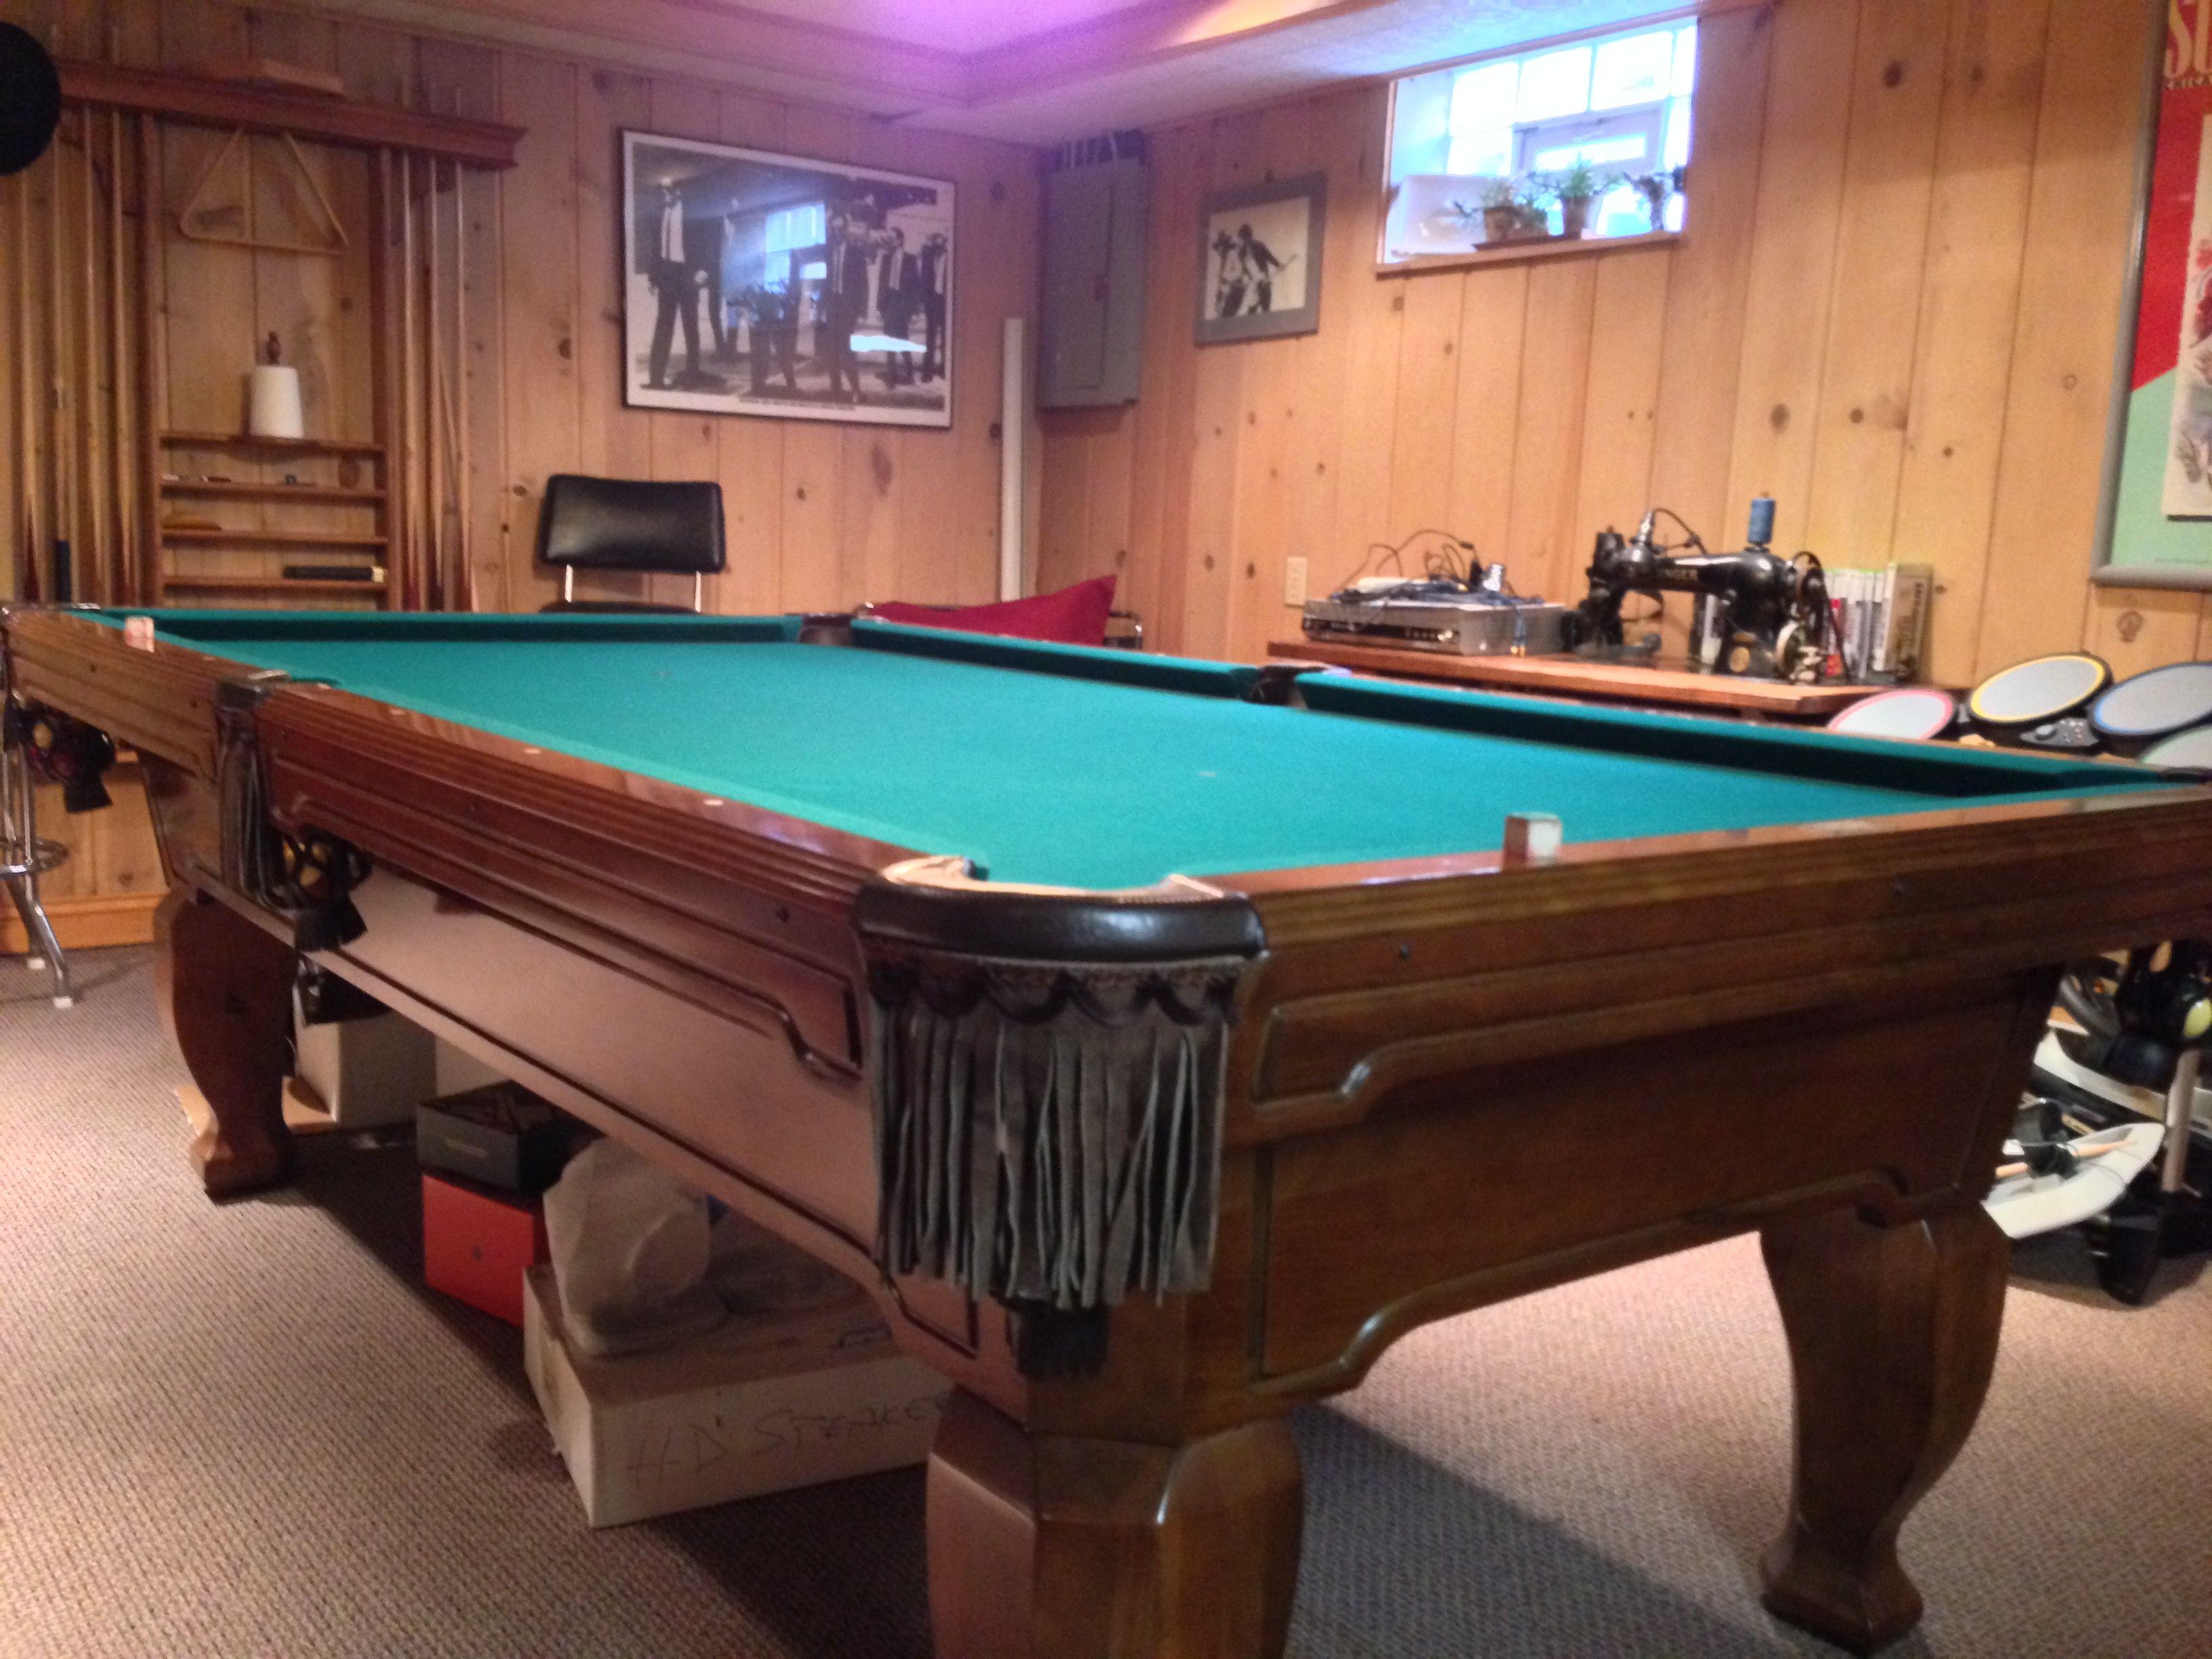 Brunswick Billiards Madison Sold Used Pool Tables Billiard Tables - Brunswick madison pool table